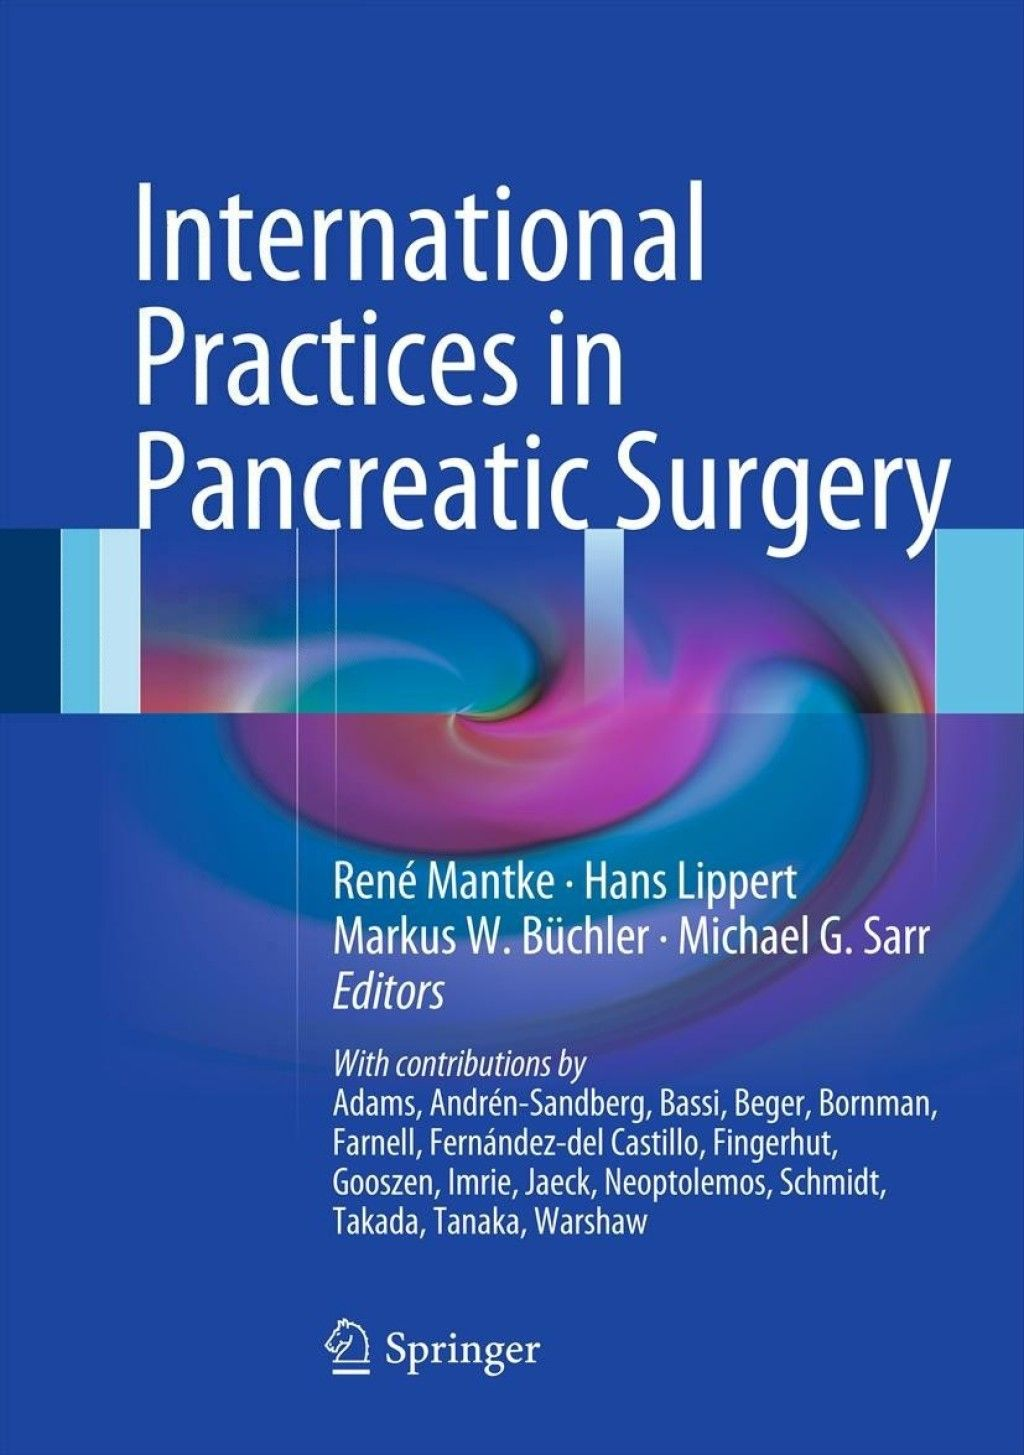 International Practices in Pancreatic Surgery (eBook) 8b02e74884f6fc6b2a4dbdfd19aecdfc